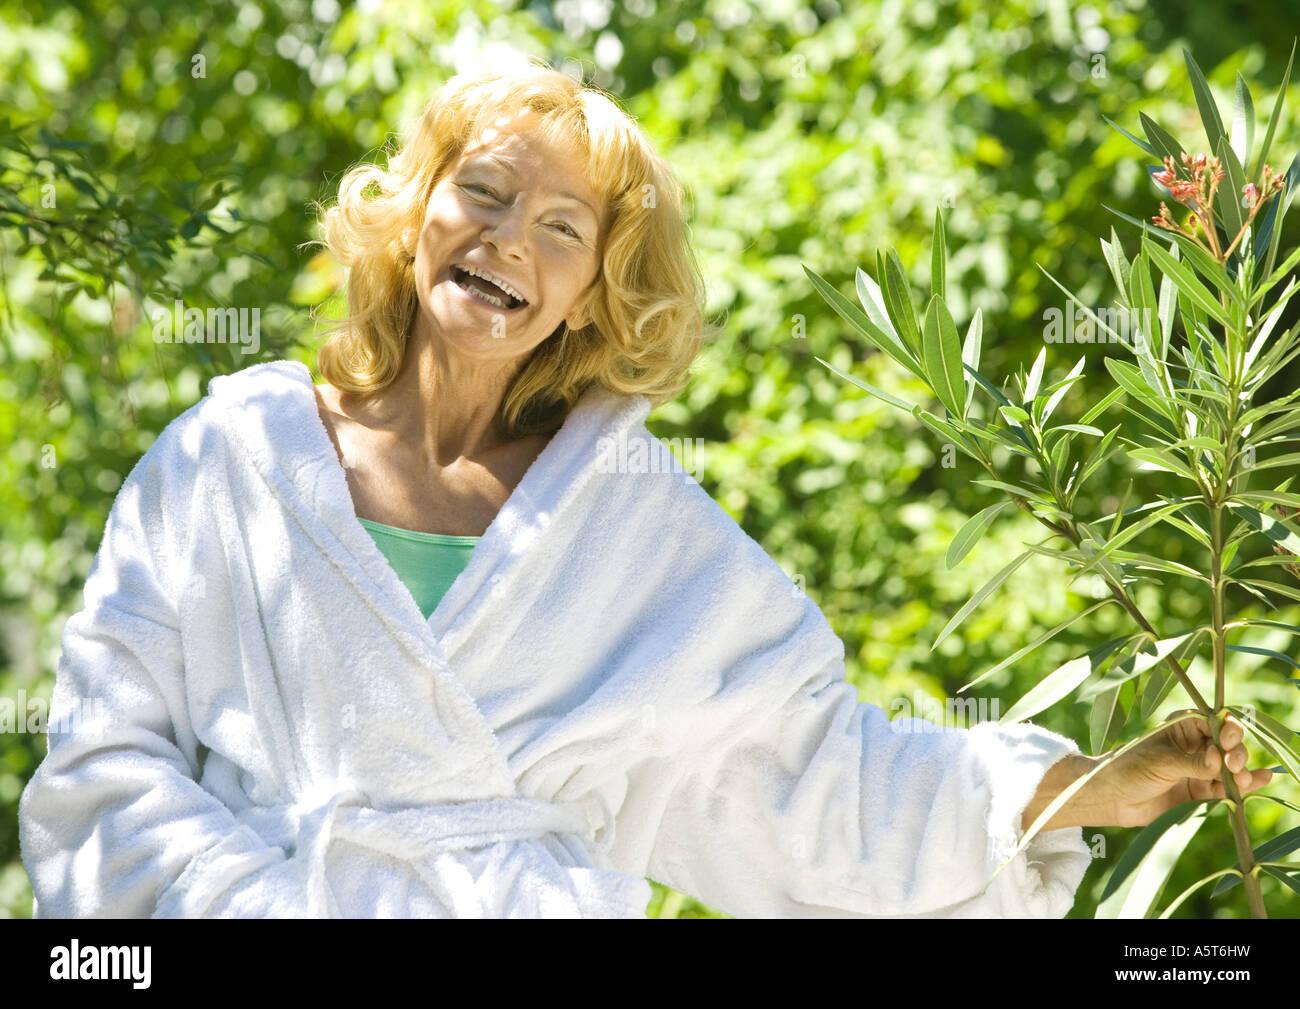 Senior woman in bathrobe holding branch of shrub, laughing - Stock Image